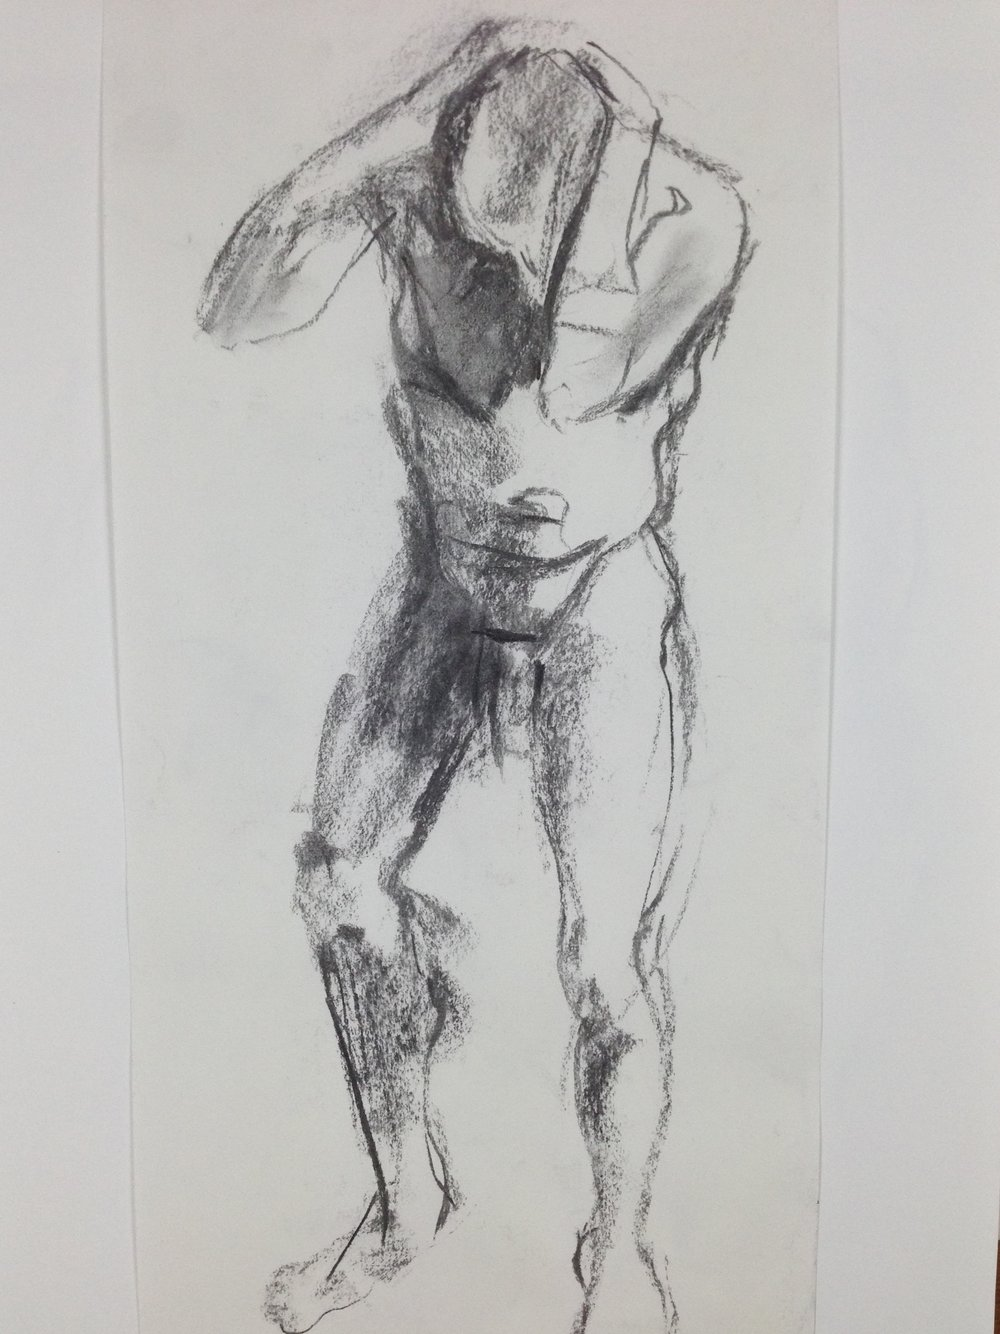 4 Minute Sketch